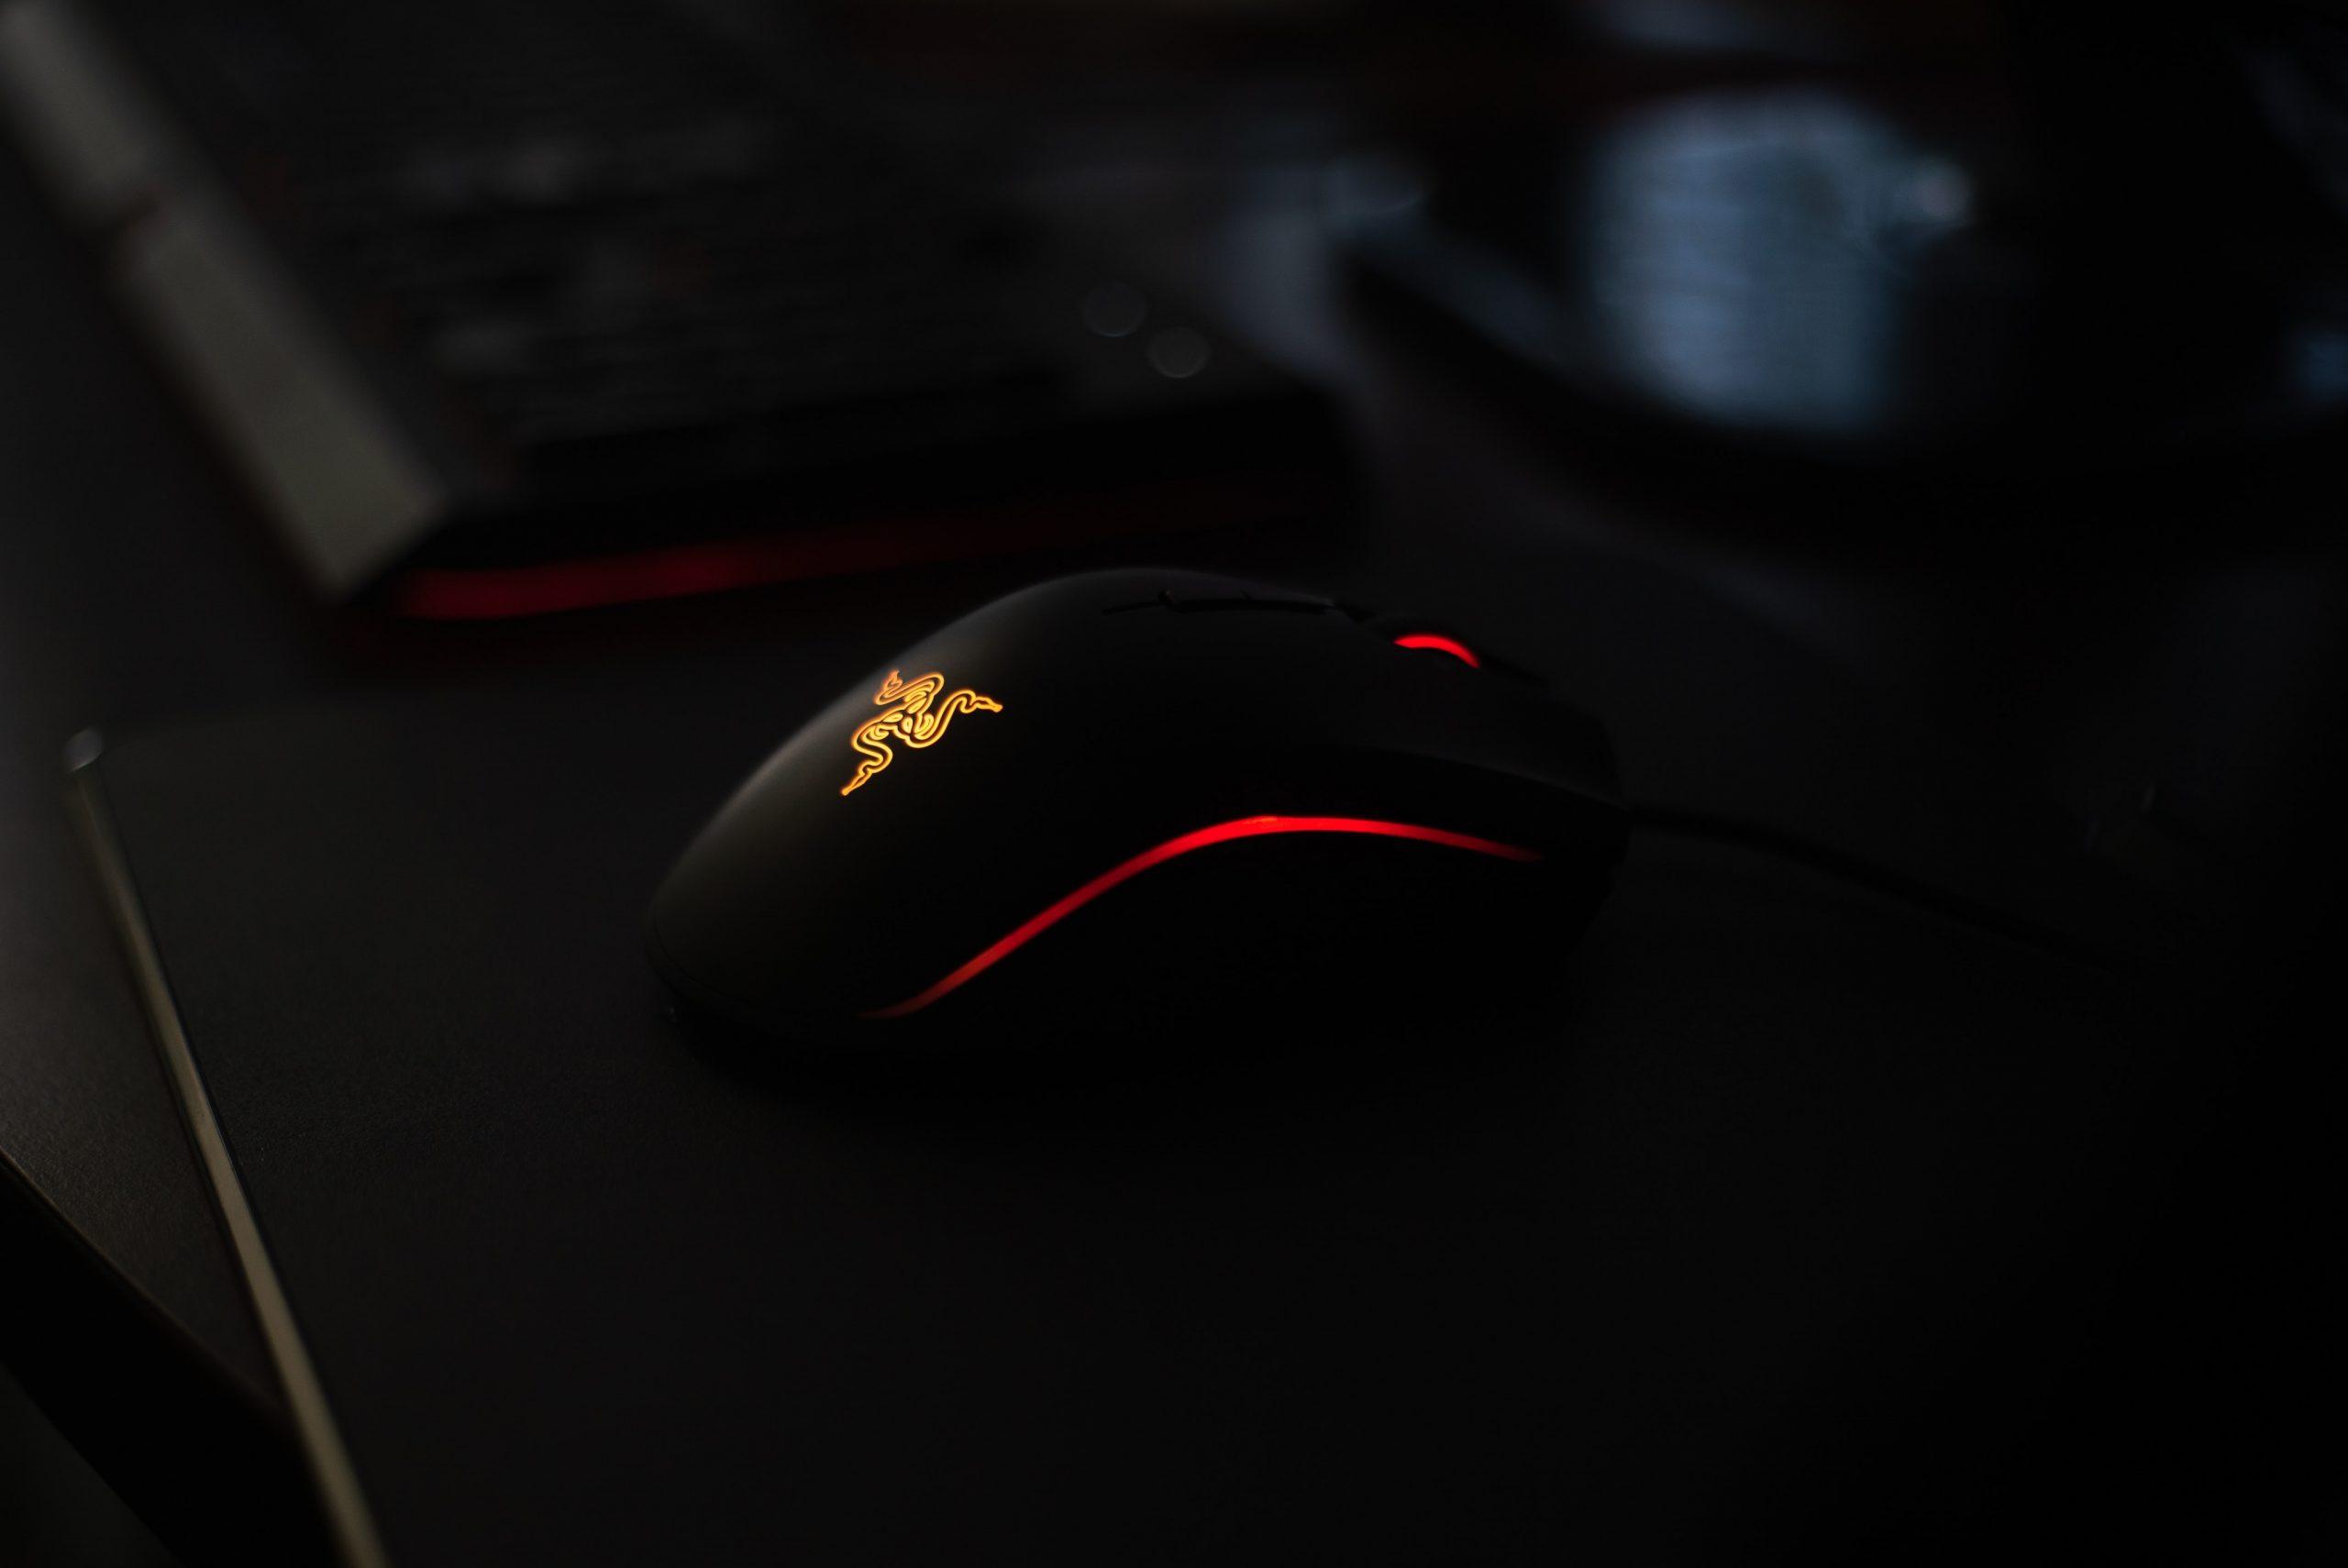 Battlefront 2 Mouse Not Working Error